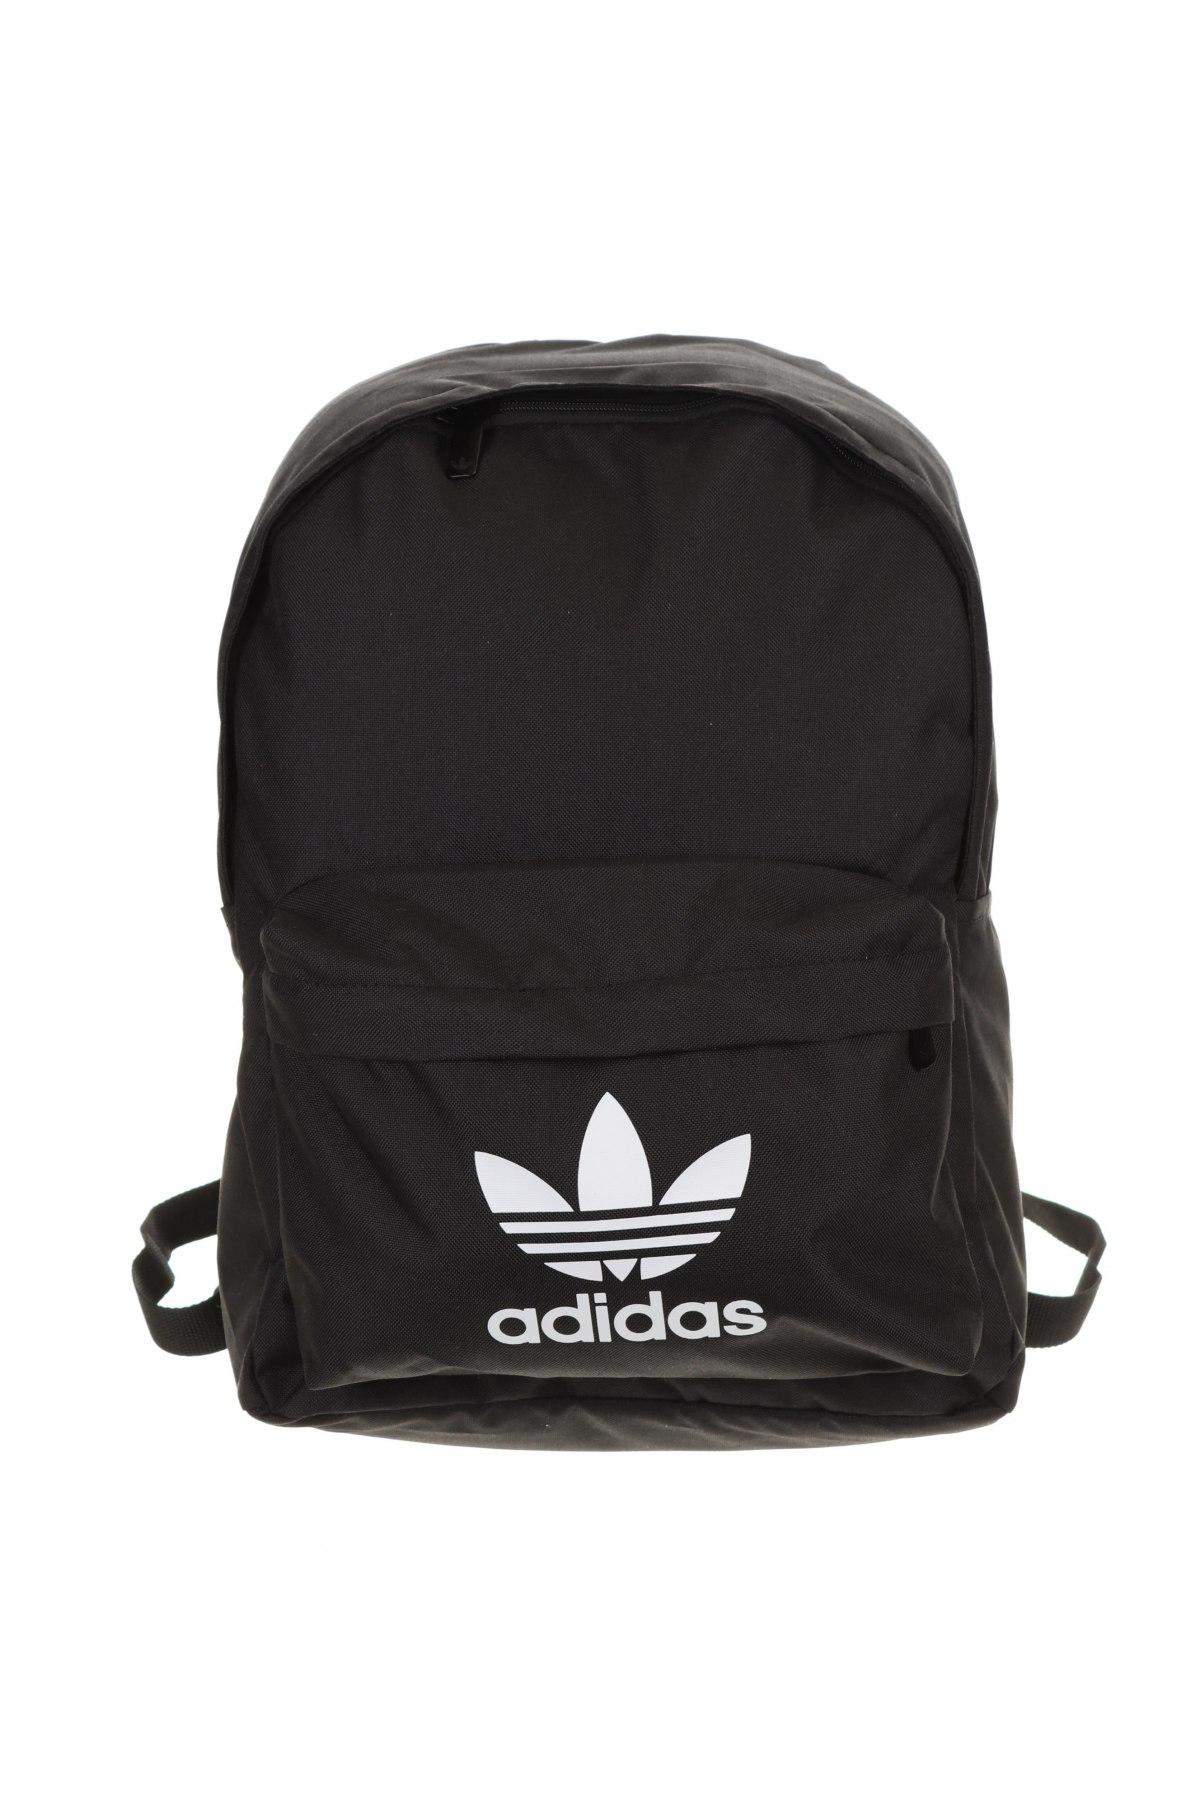 Раница Adidas Originals, Цвят Черен, Текстил, Цена 59,25лв.